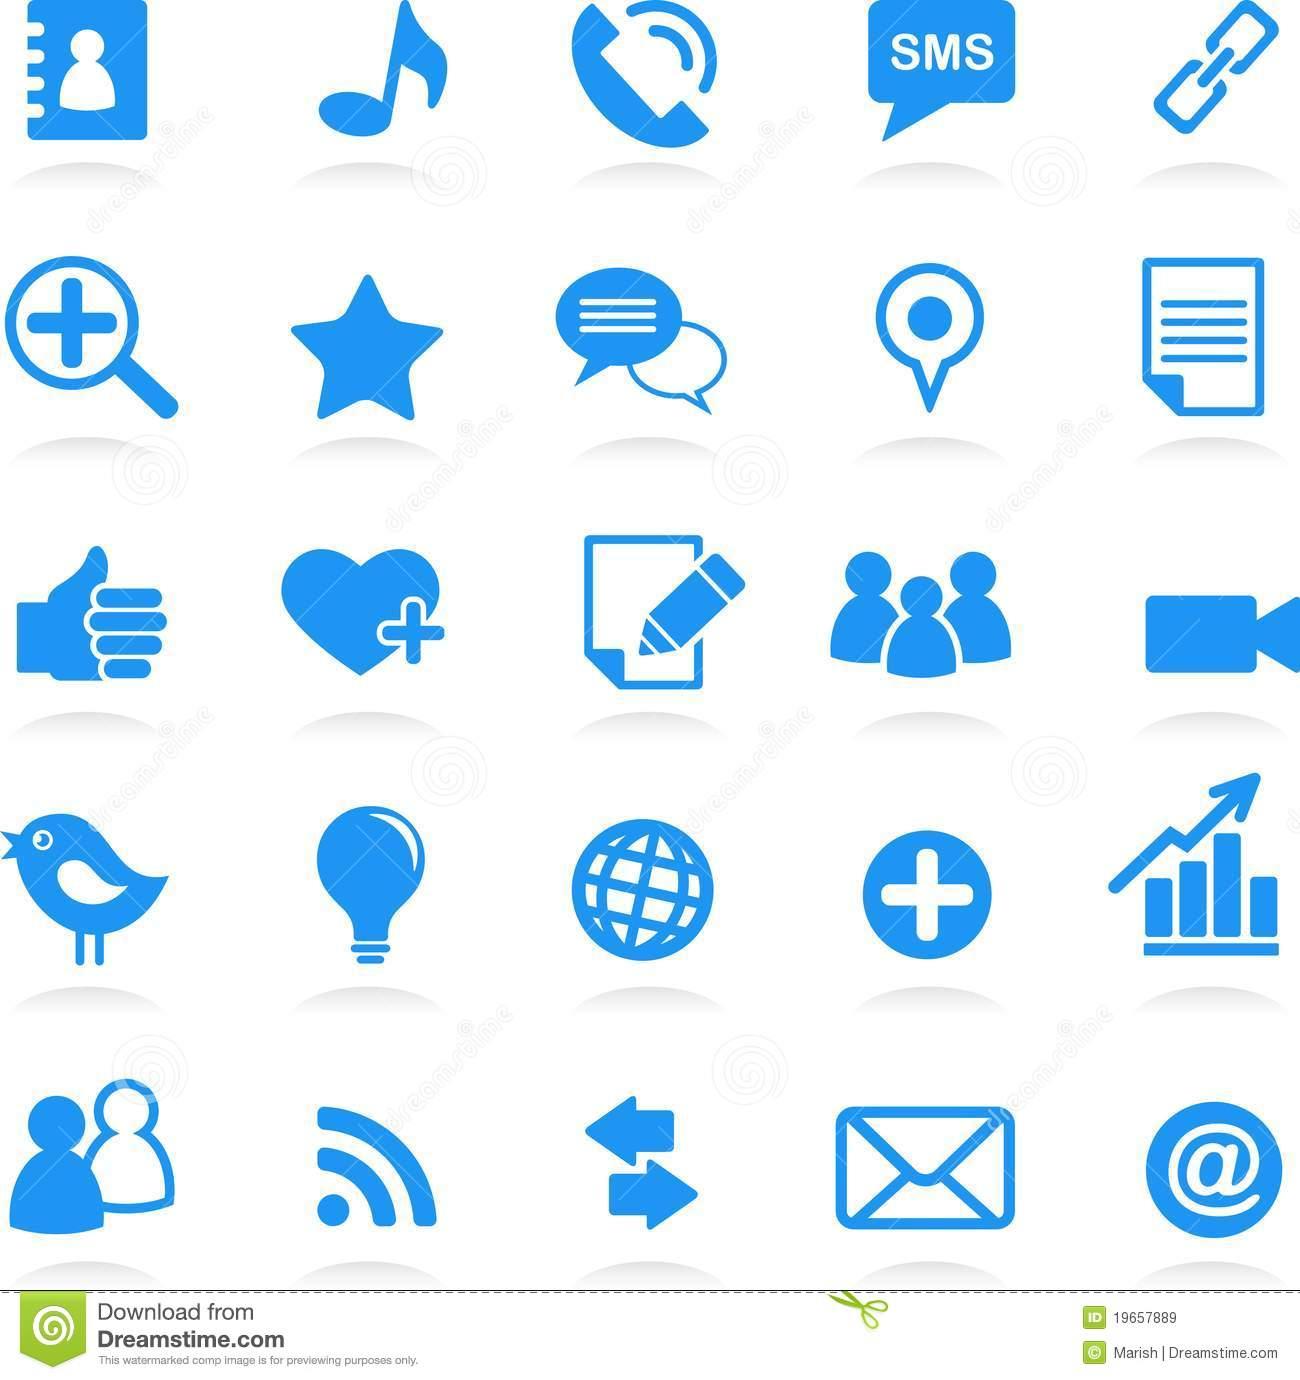 Social Network Icons Free